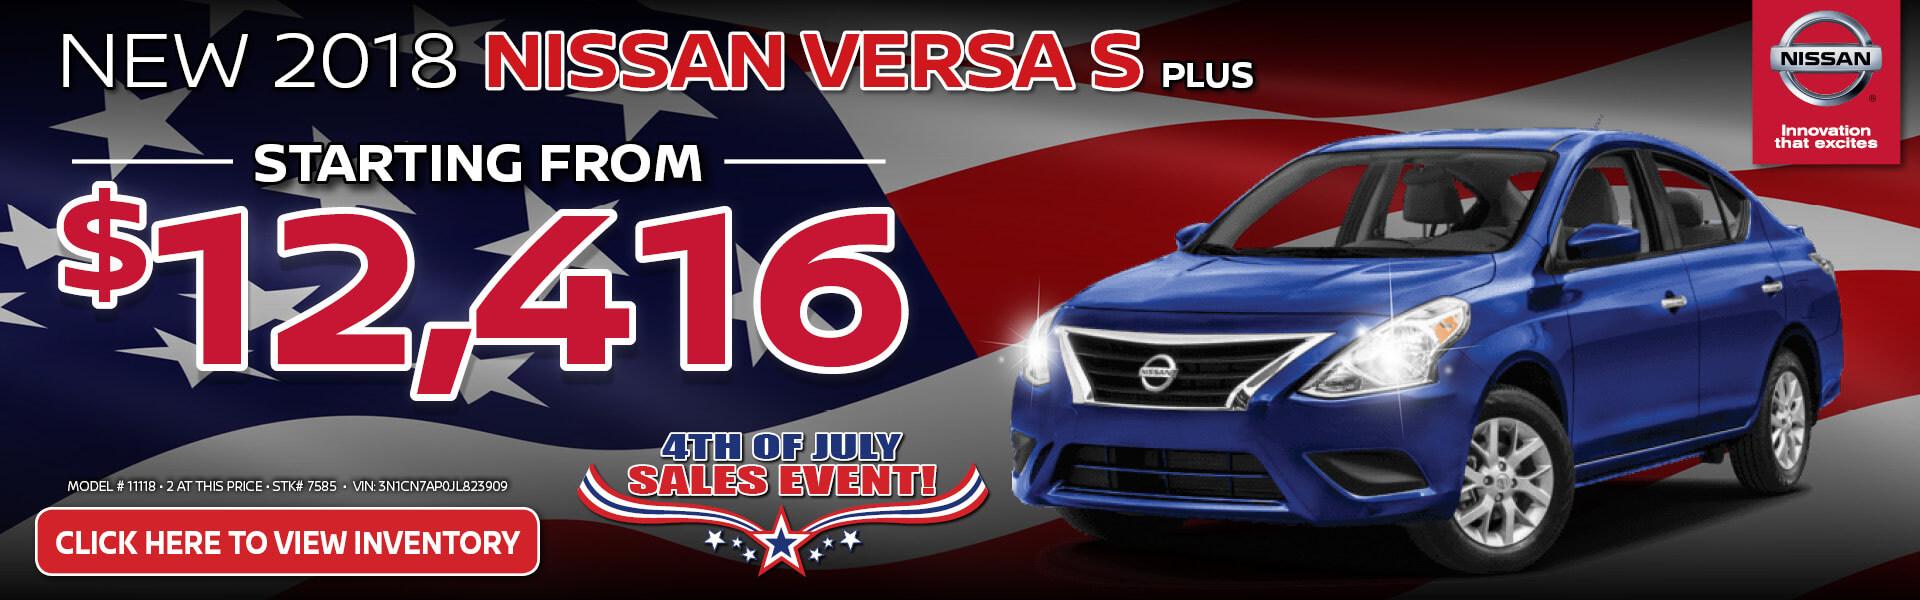 Nissan Versa S Plus $12,416 Purchase